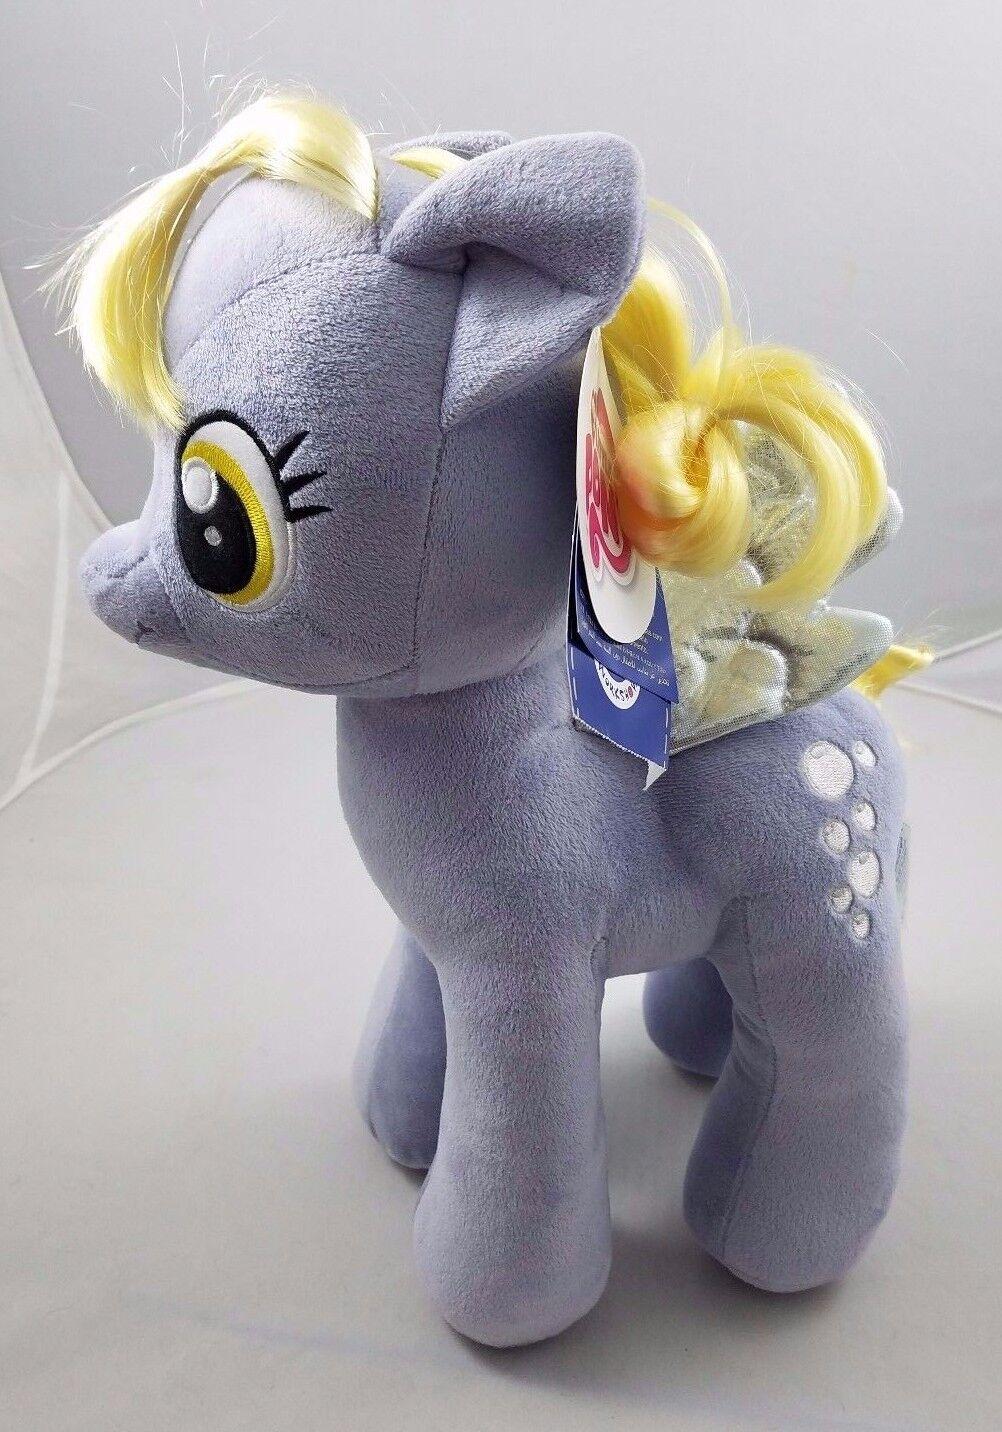 Nwt Build a Orso Mlp My Little Pony Muffin Imbottita Grigio Horse BABW Bab Bolle